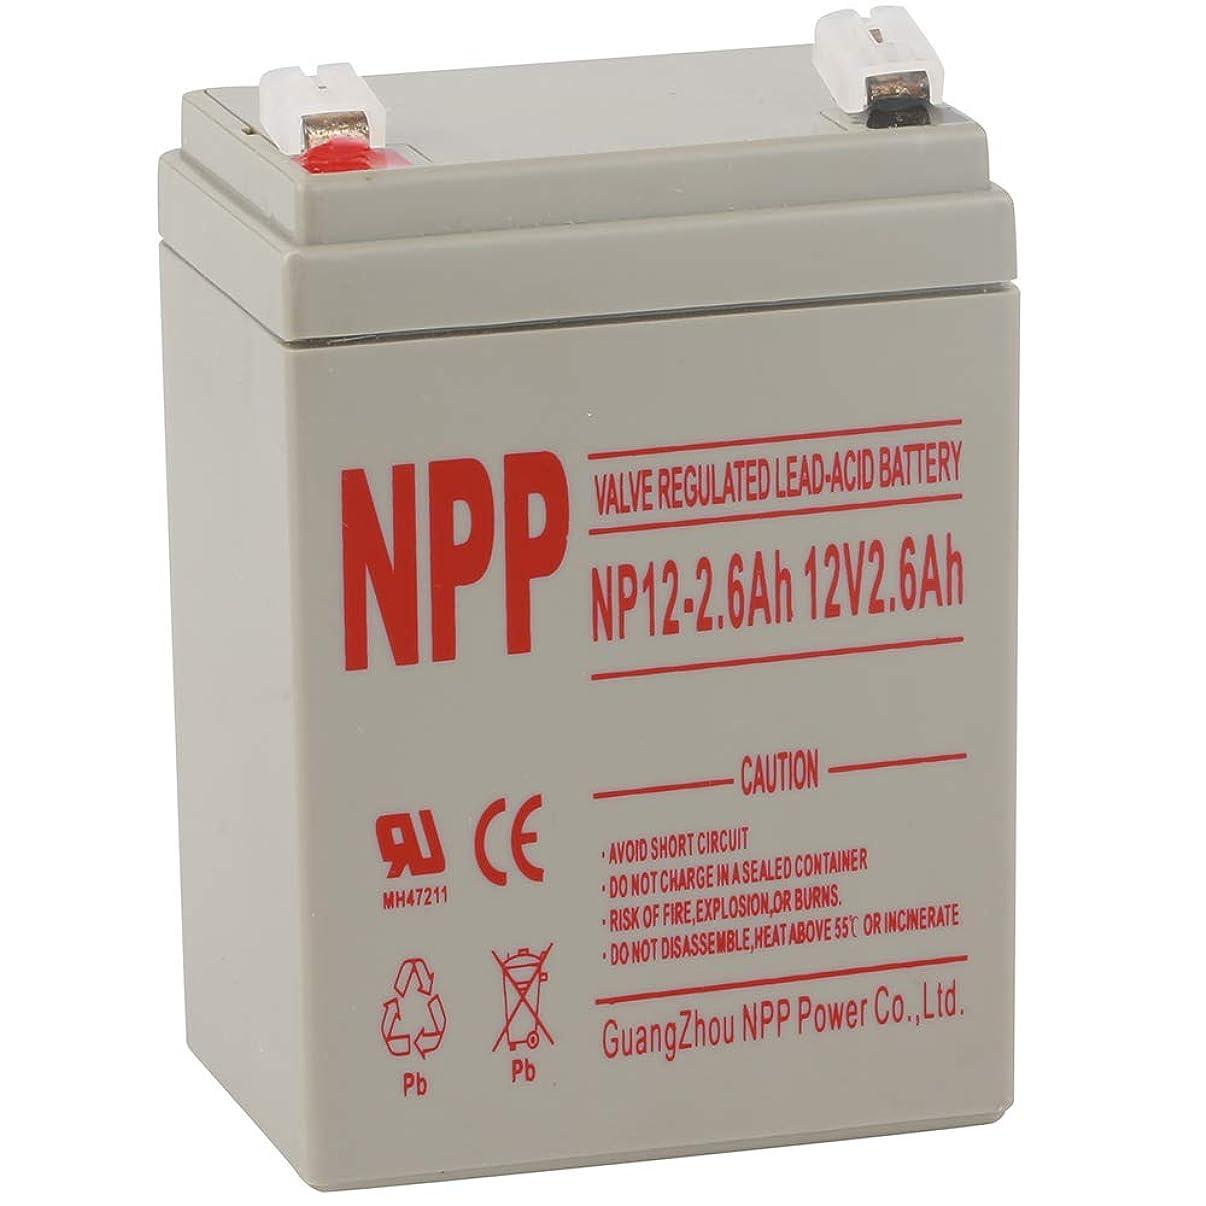 NPP NP12-2.6Ah 12V 2.6 Amp Audio UPS Emergency Lighting Battery